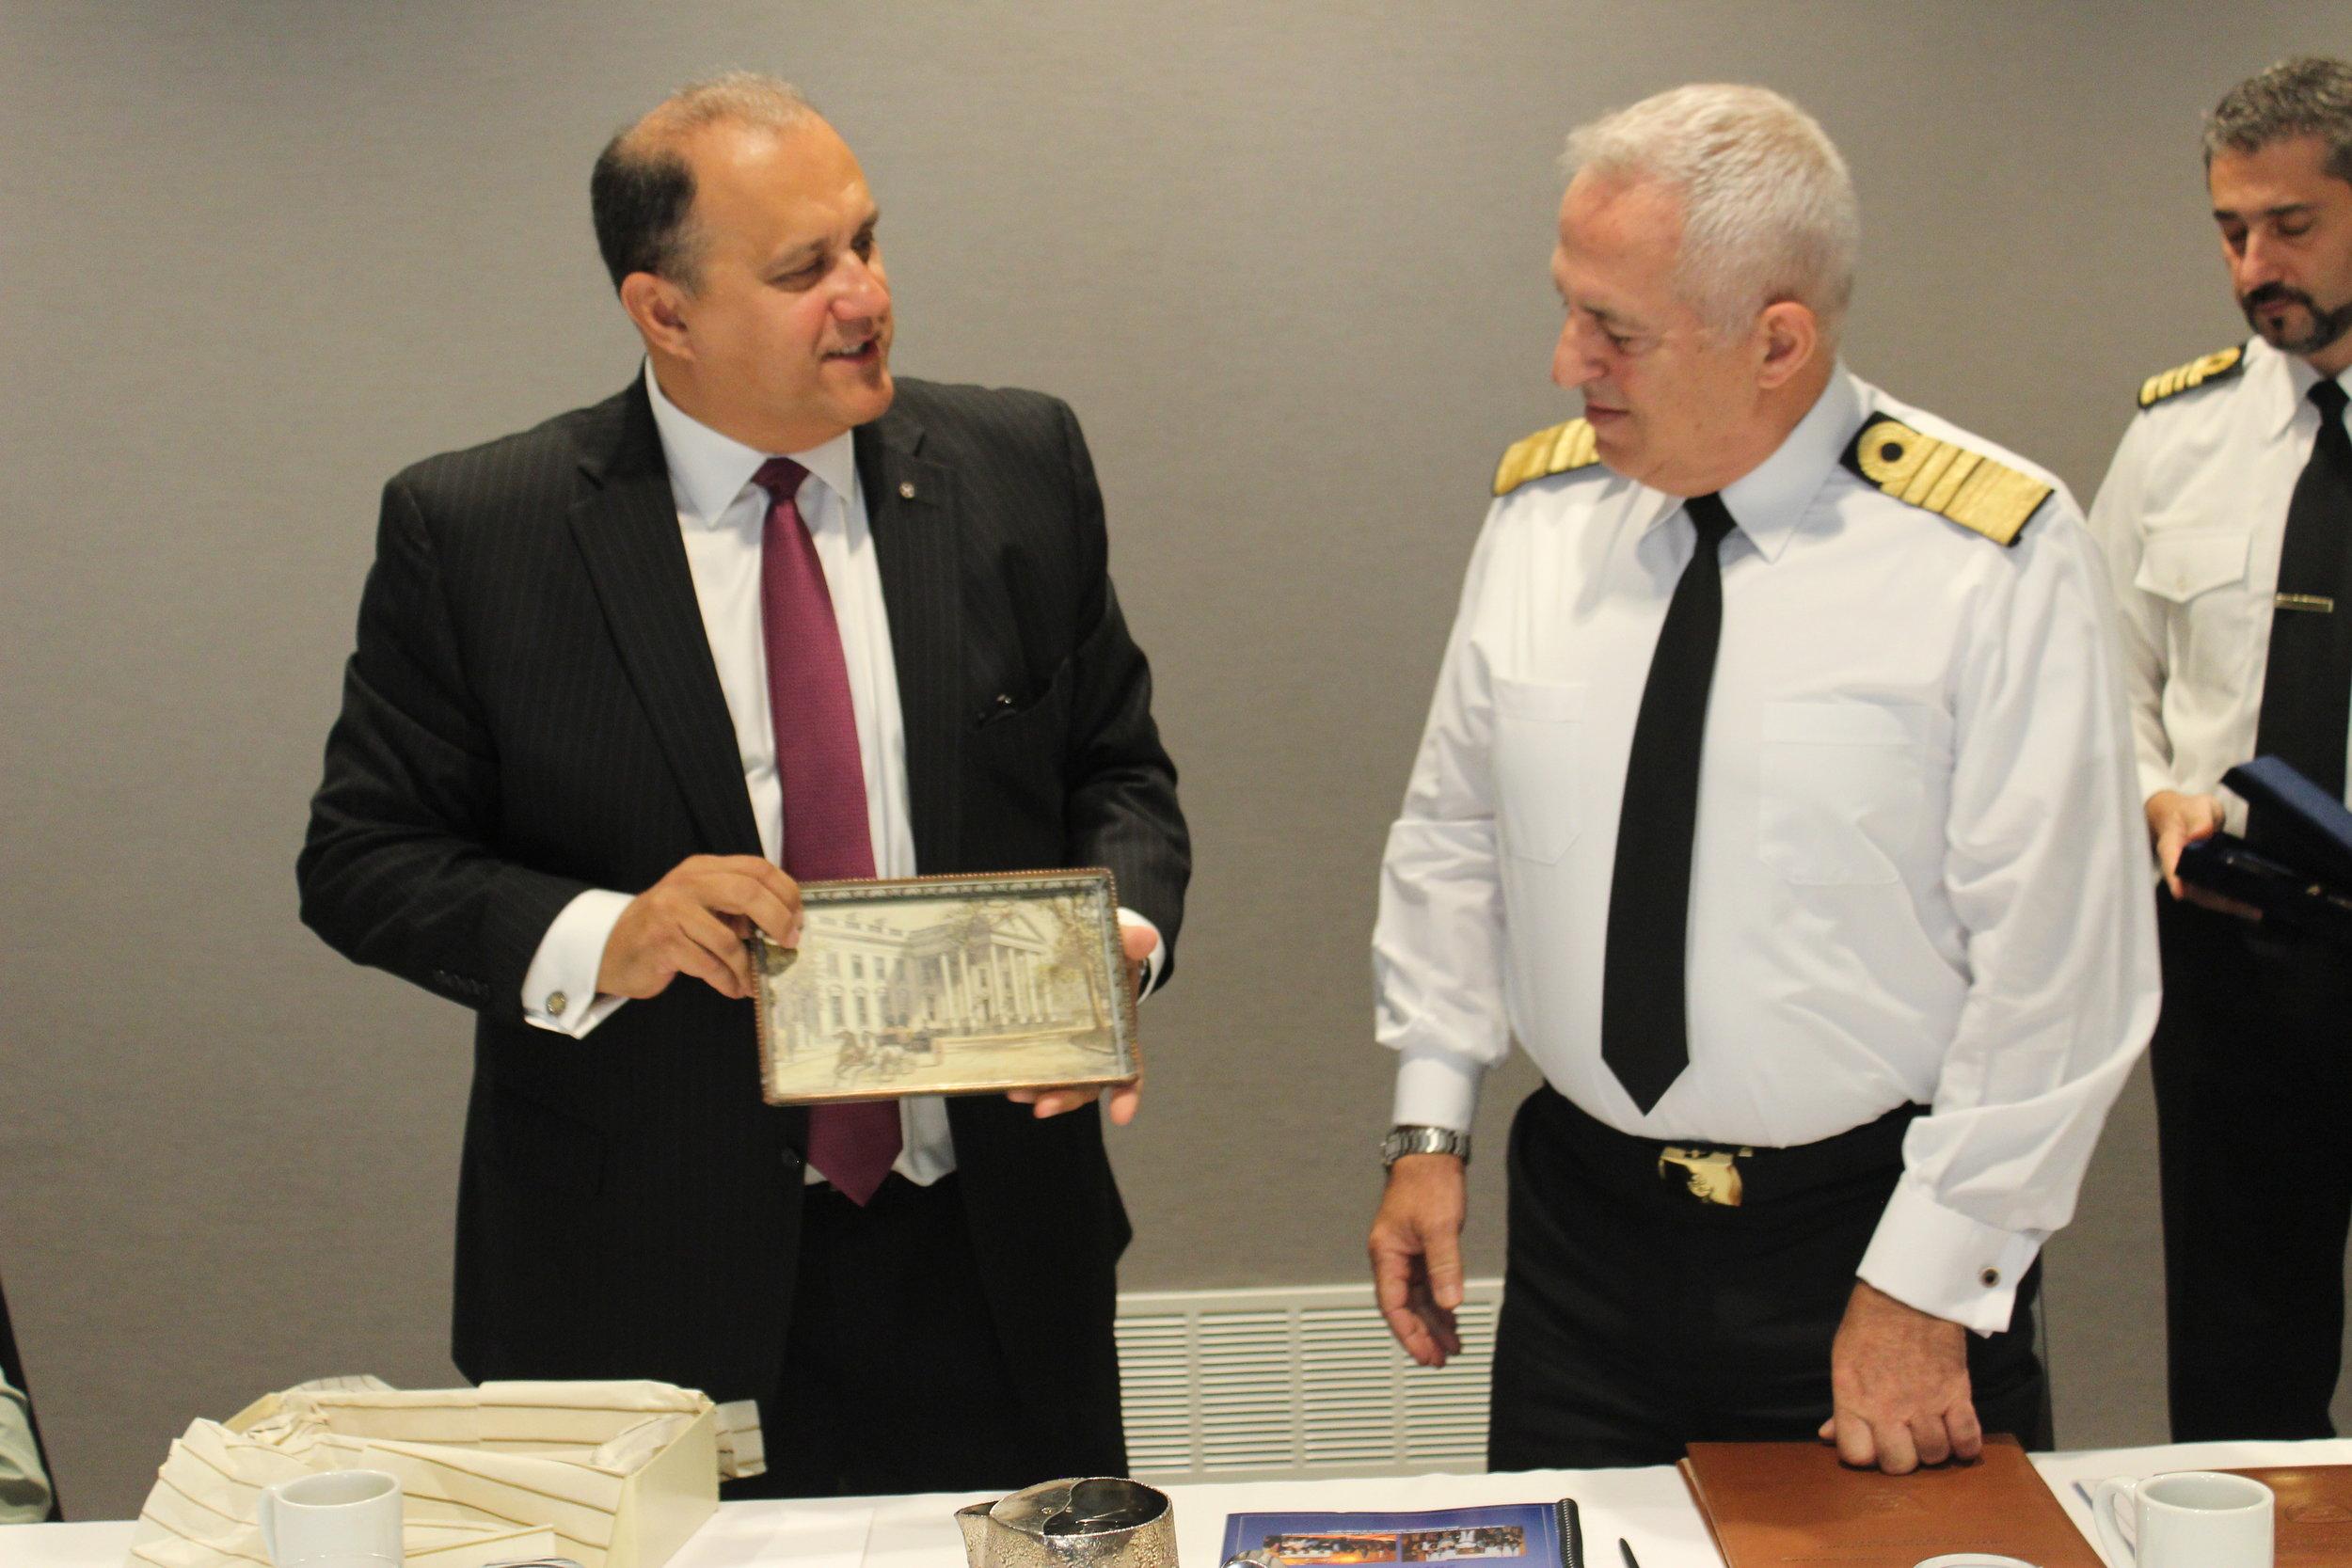 Nick Larigakis provides Admiral Apostolakis with a memento.